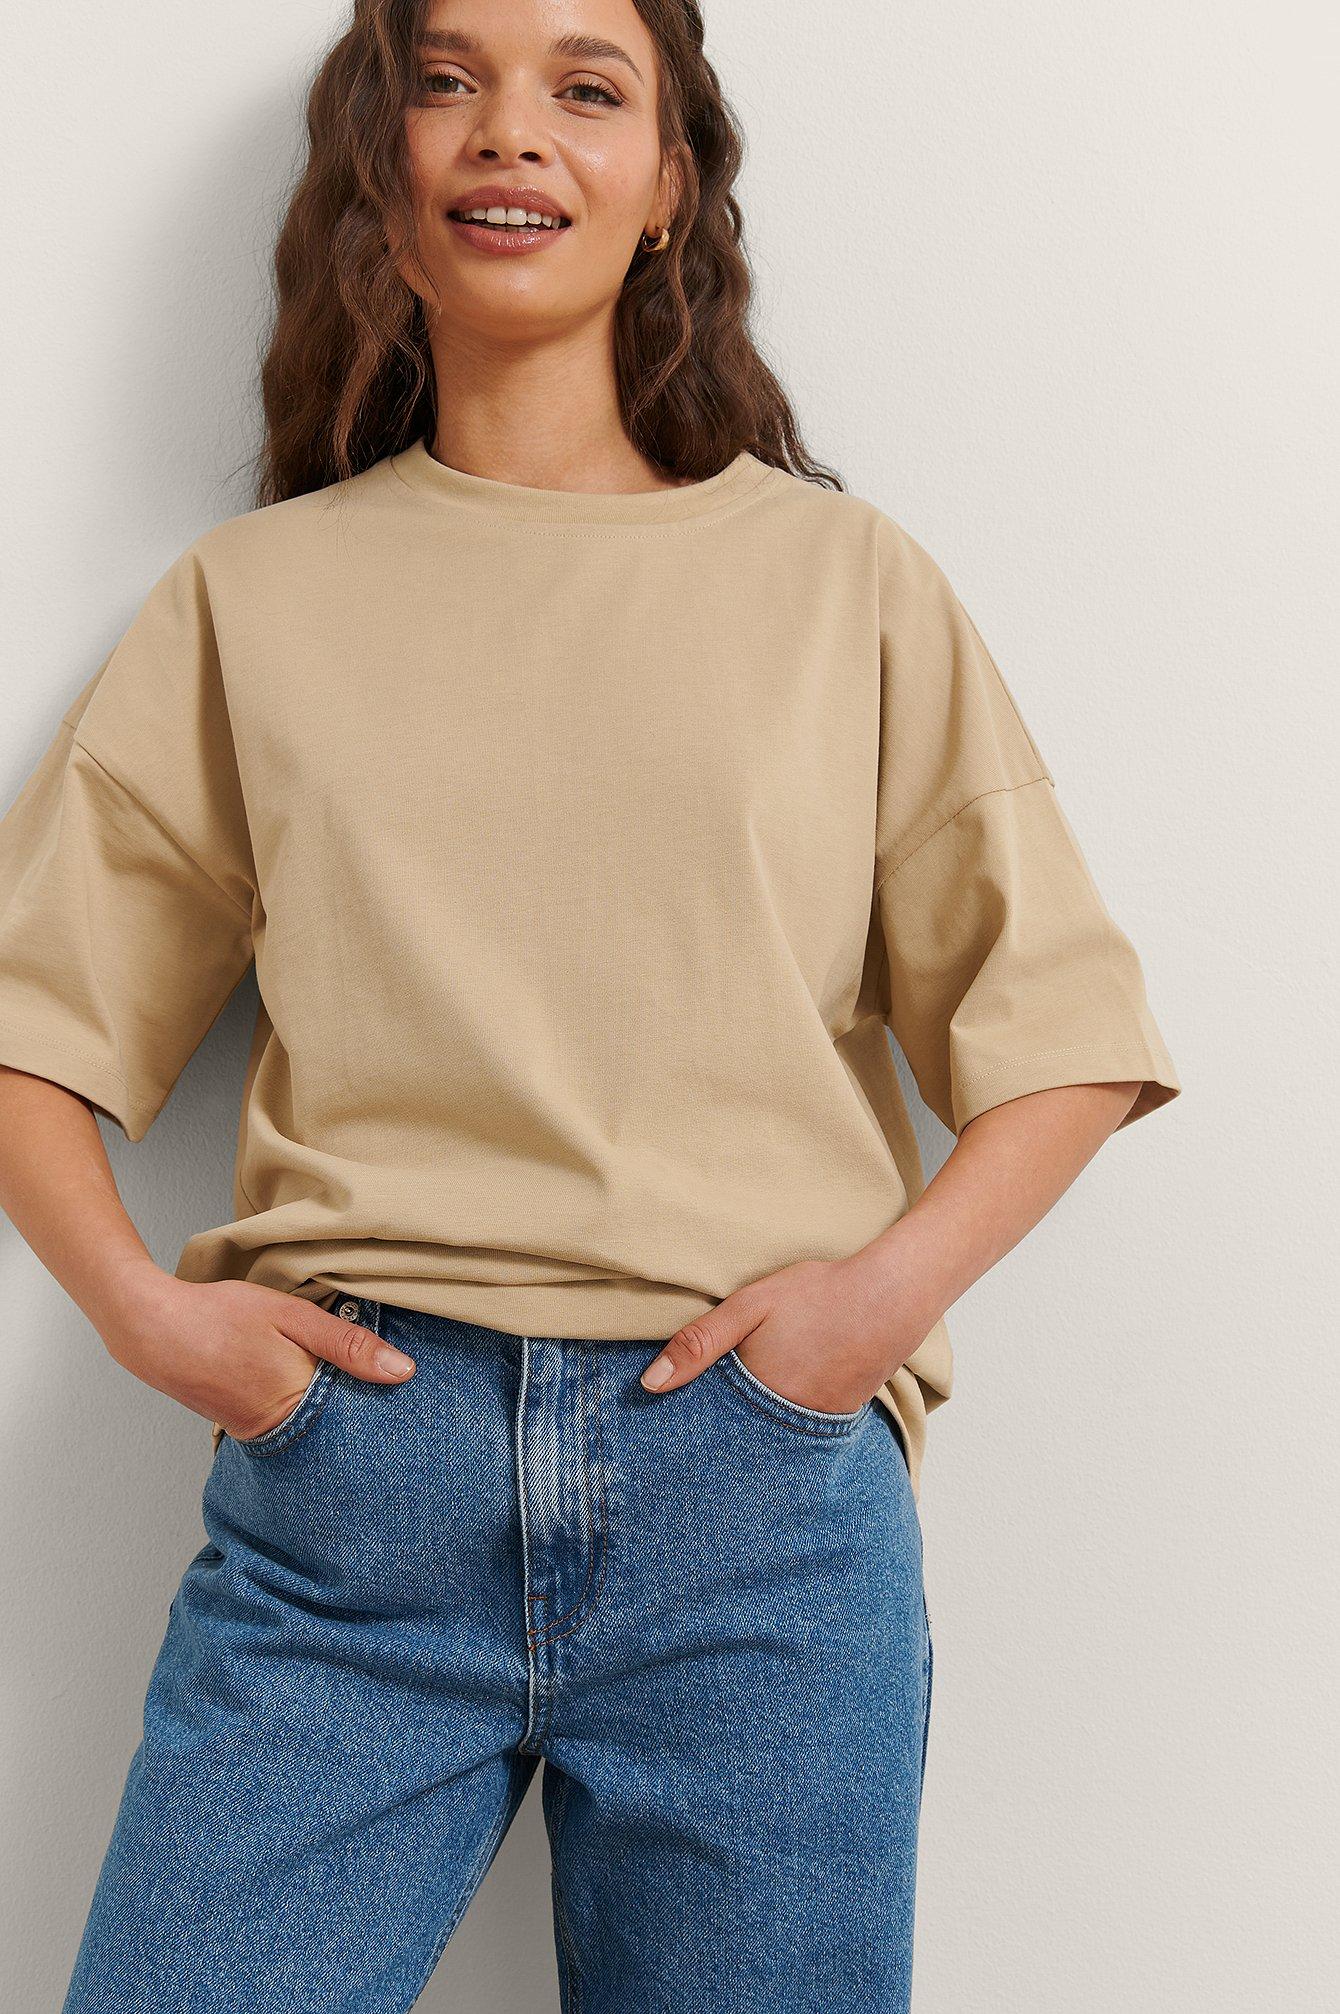 Rianne Meijer x NA-KD Økologisk Basic T-skjorte - Beige